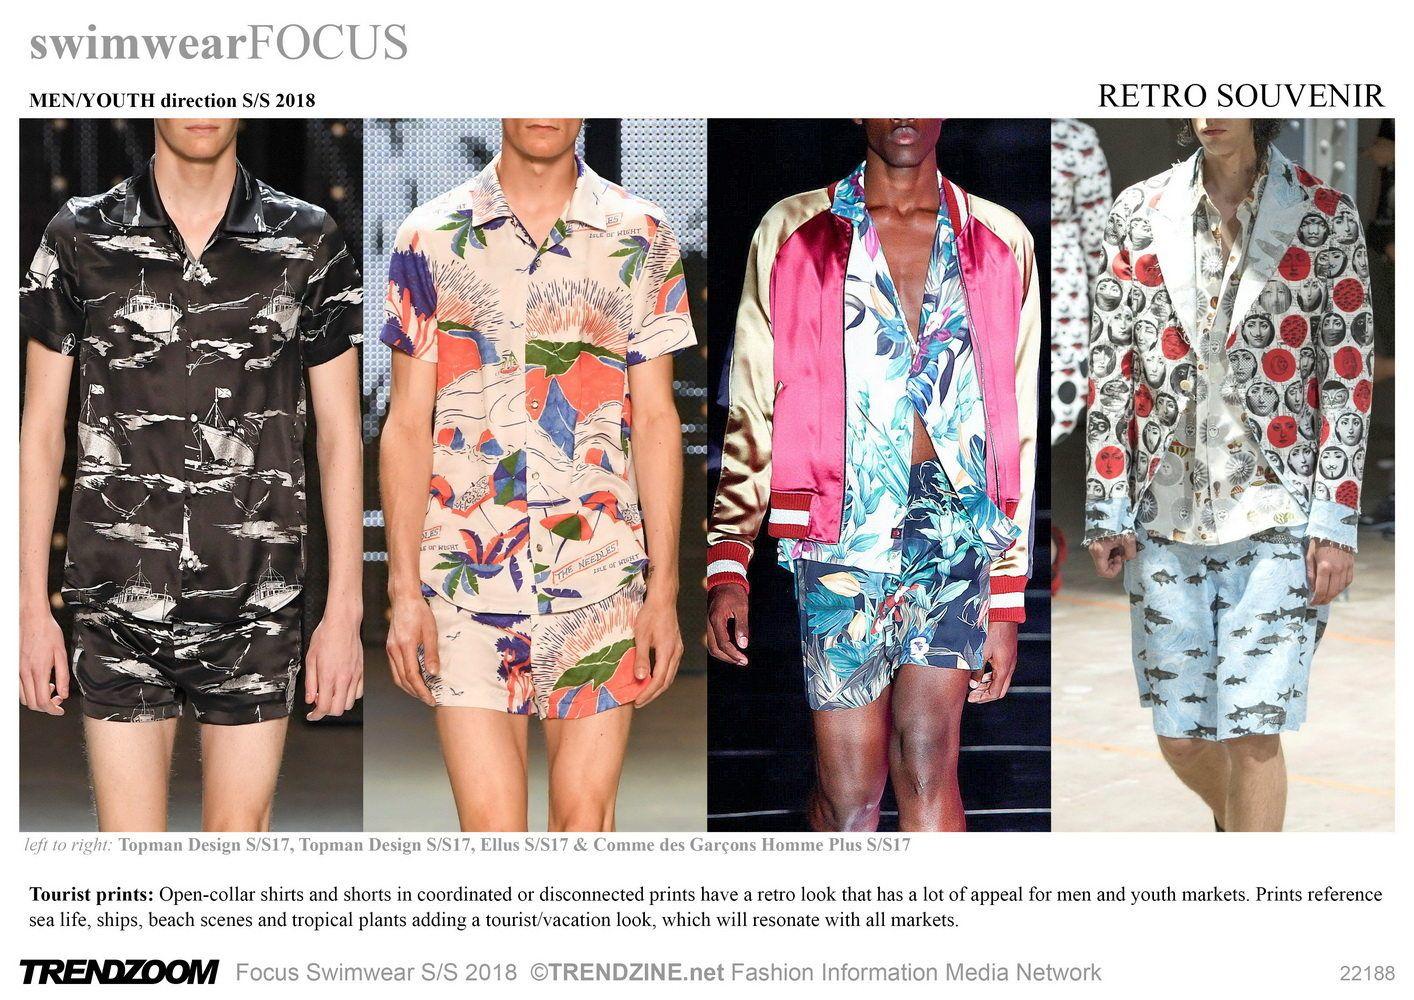 Trendzoom: FOCUS Swimwear S/S 2018 - Trends (#722165 ...